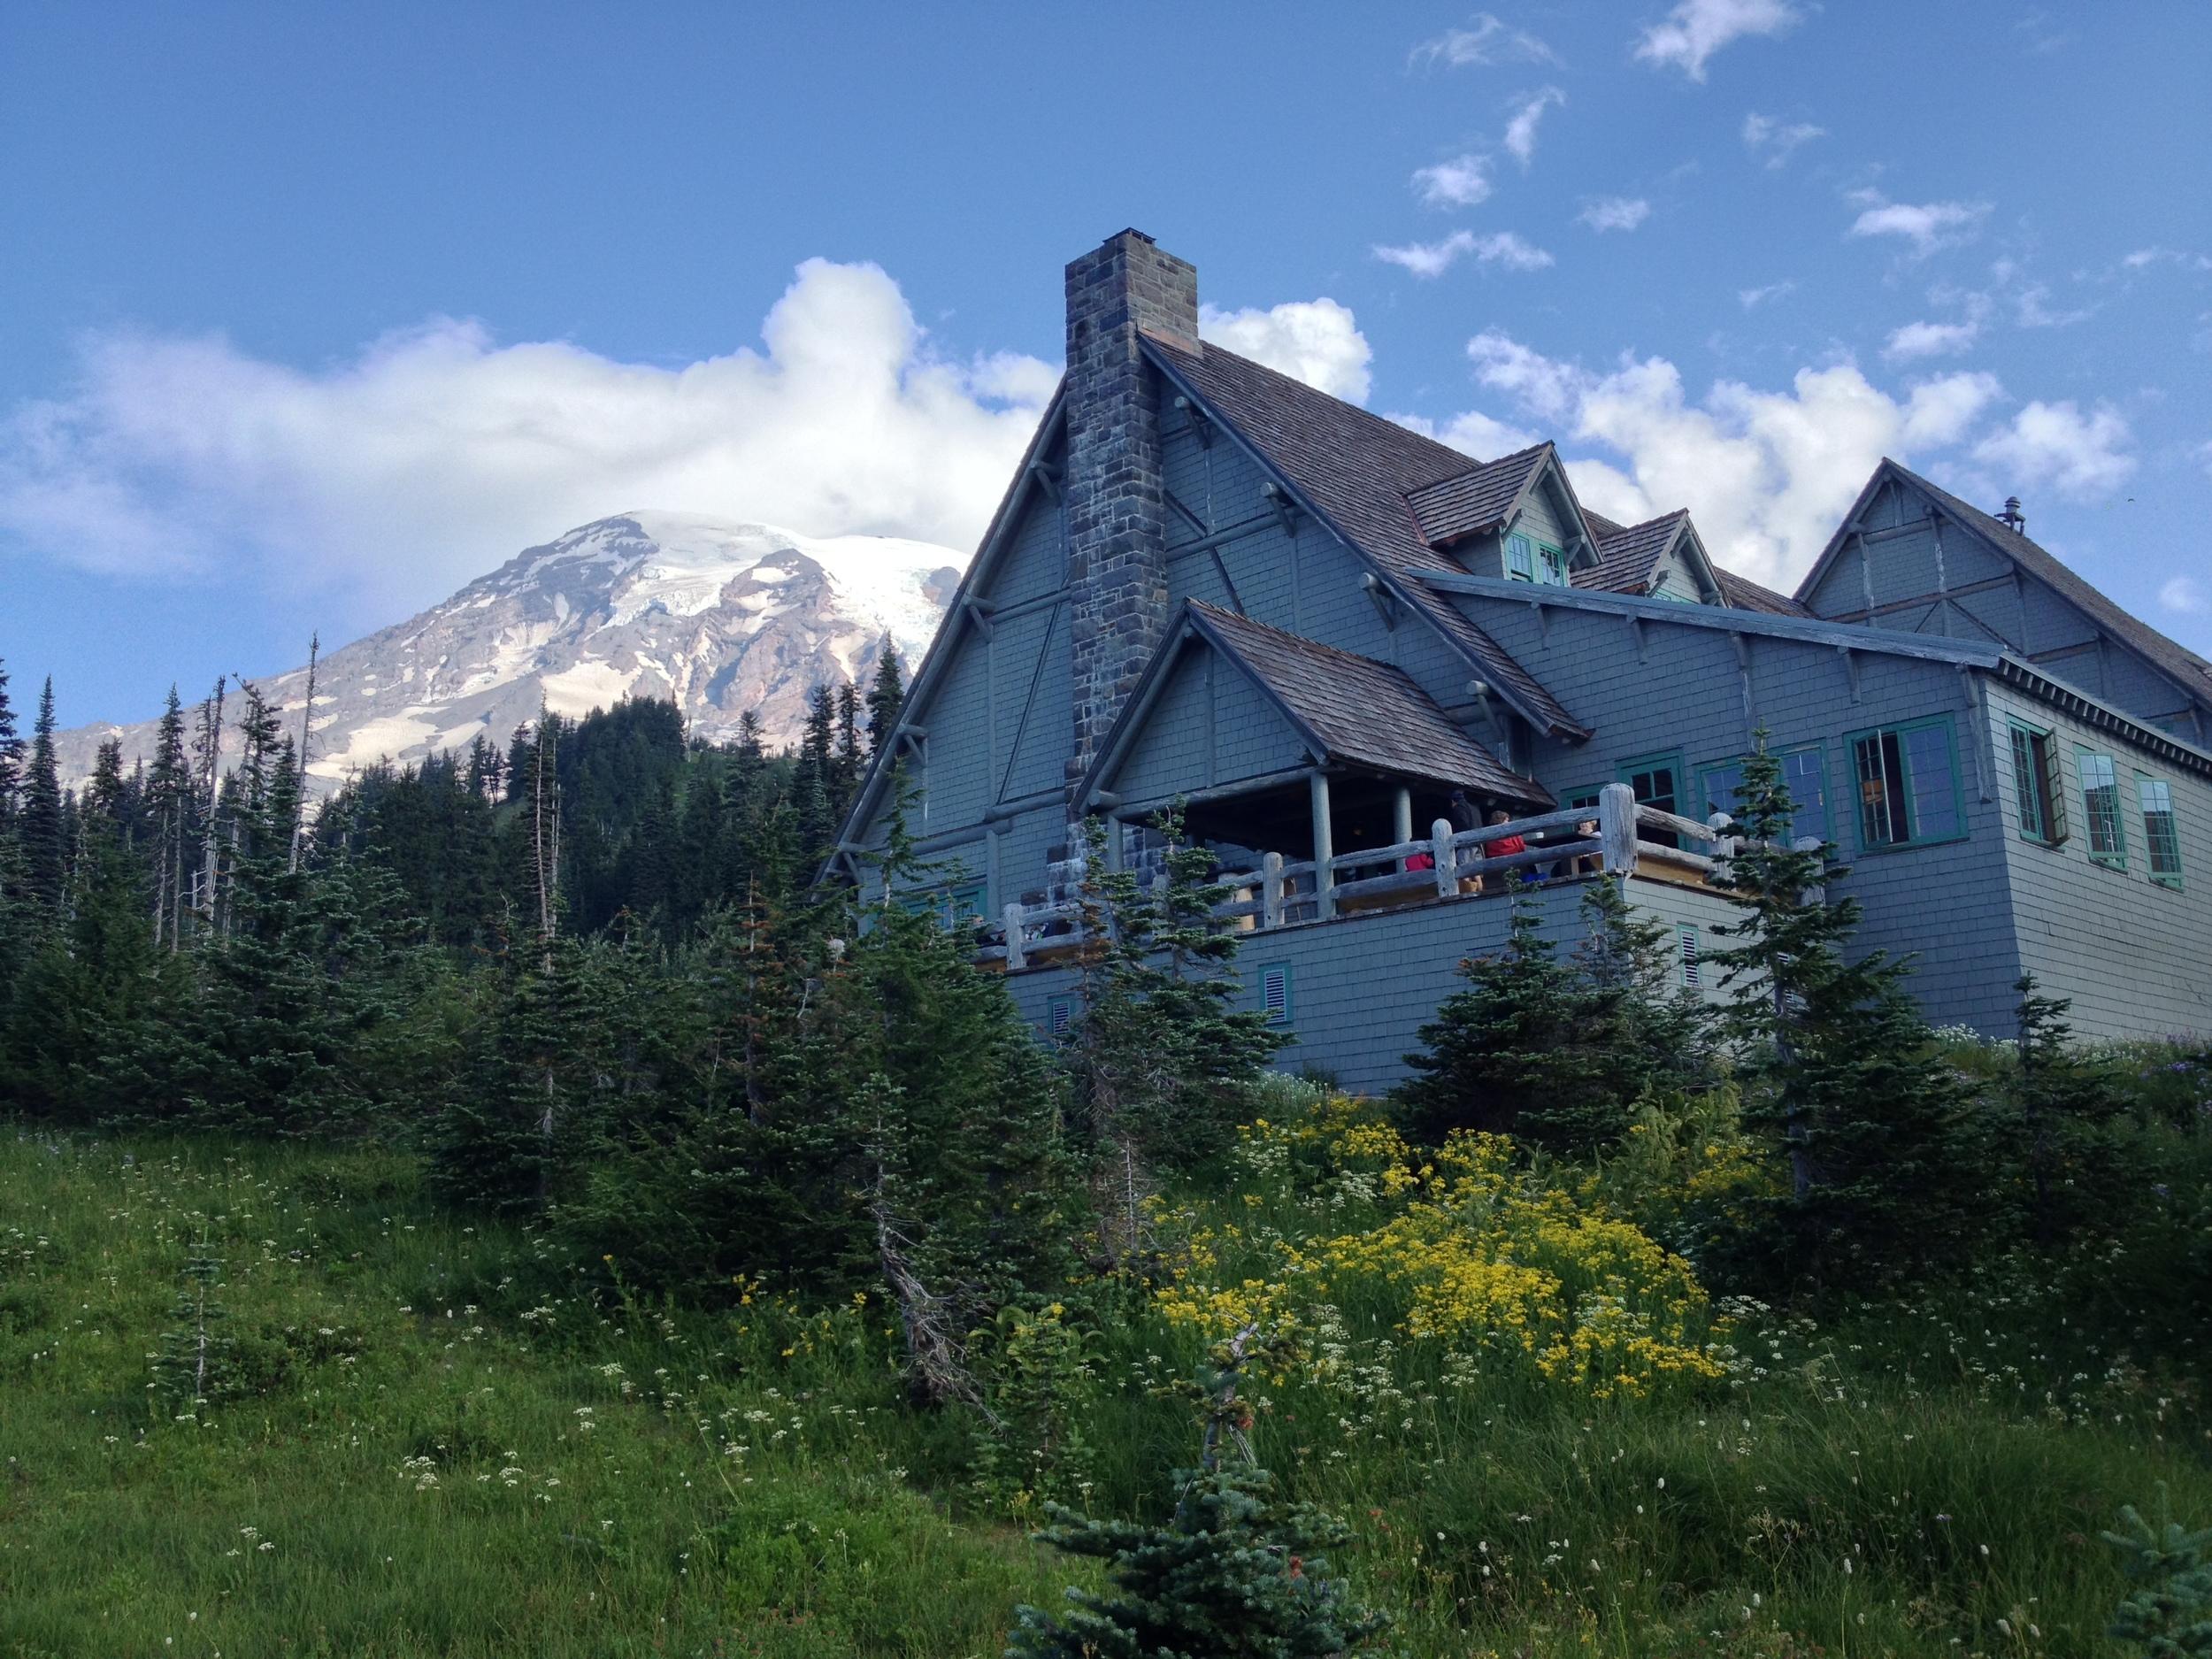 A quick iPhone shot of the Paradise Inn on Mount Rainier.